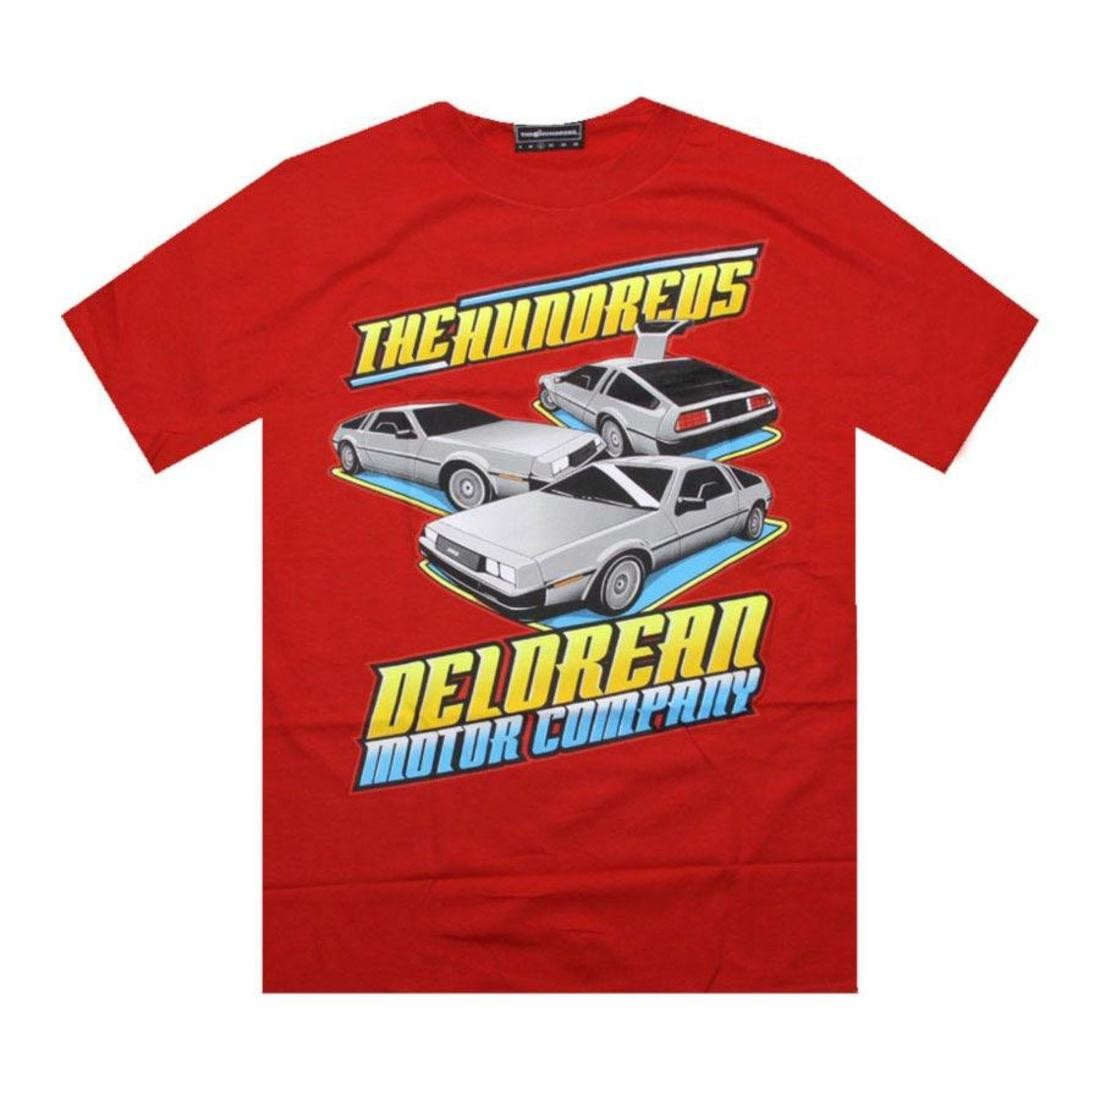 Tシャツ 赤 レッド 【 RED THE HUNDREDS DELOREAN MOTOR COMPANY DMC CAR SHOW TEE 】 メンズファッション トップス Tシャツ カットソー